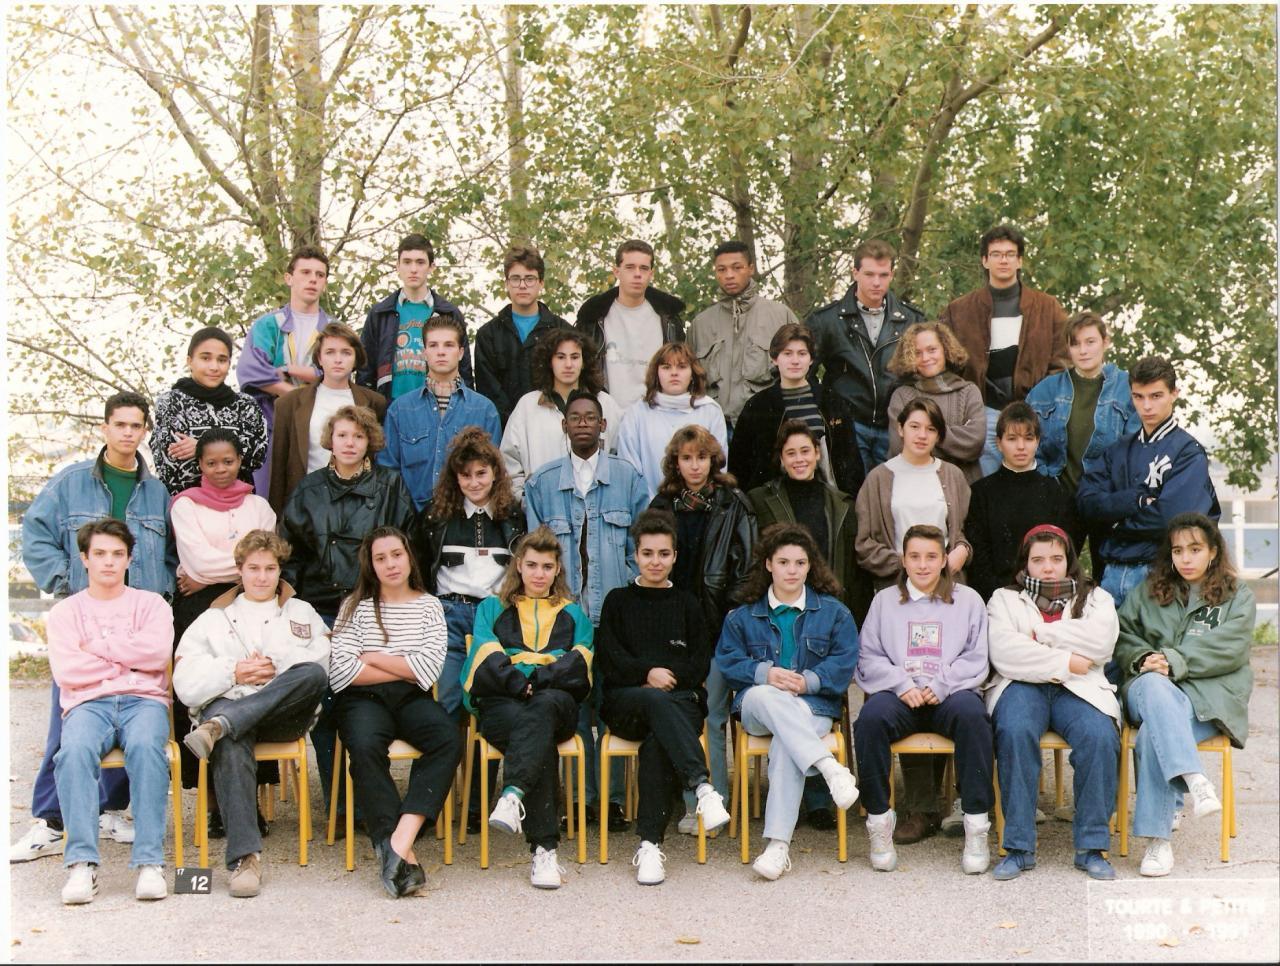 1991 - 1 Gbis